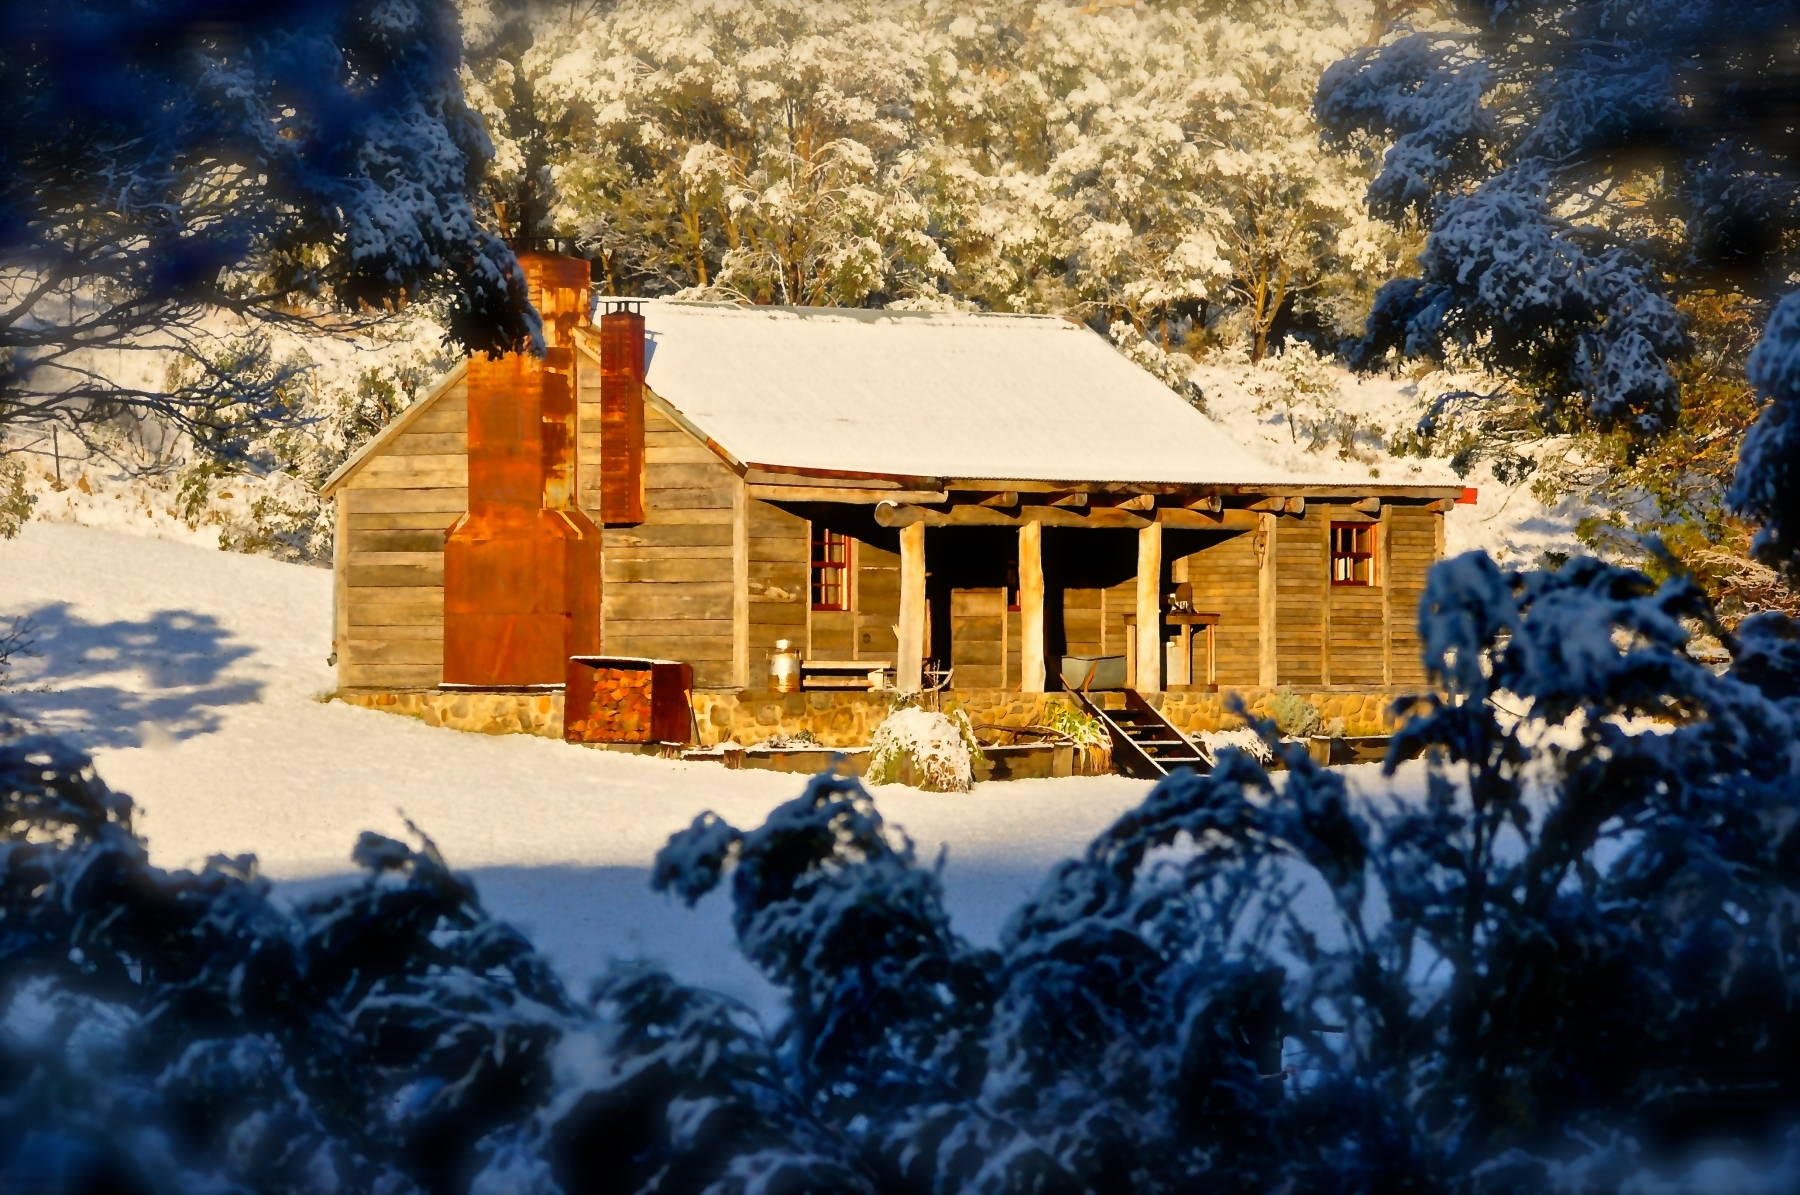 Deep Winter Snow at Moonbah River Hut